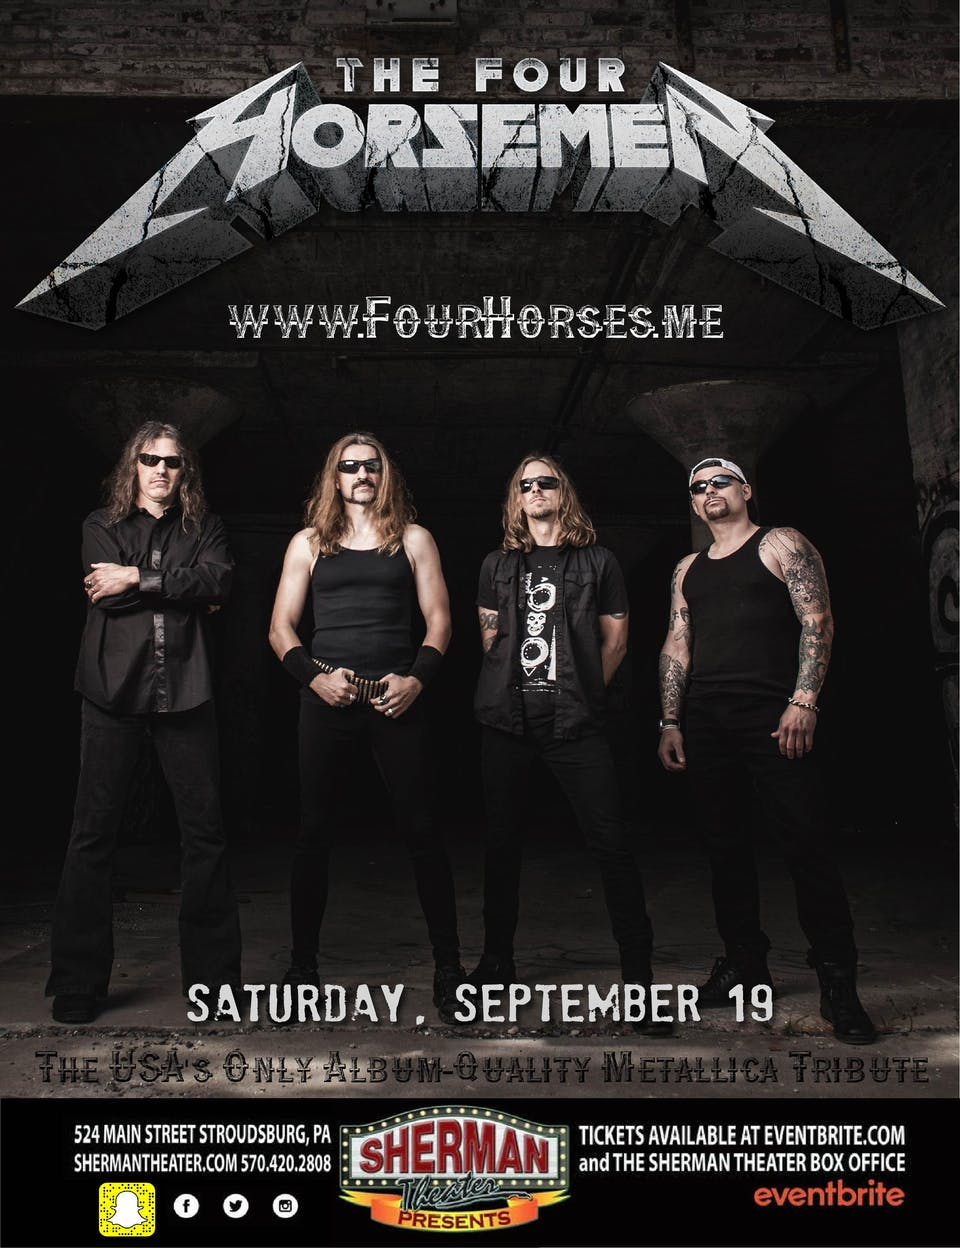 The Four Horsemen - The ULTIMATE Metallica Tribute